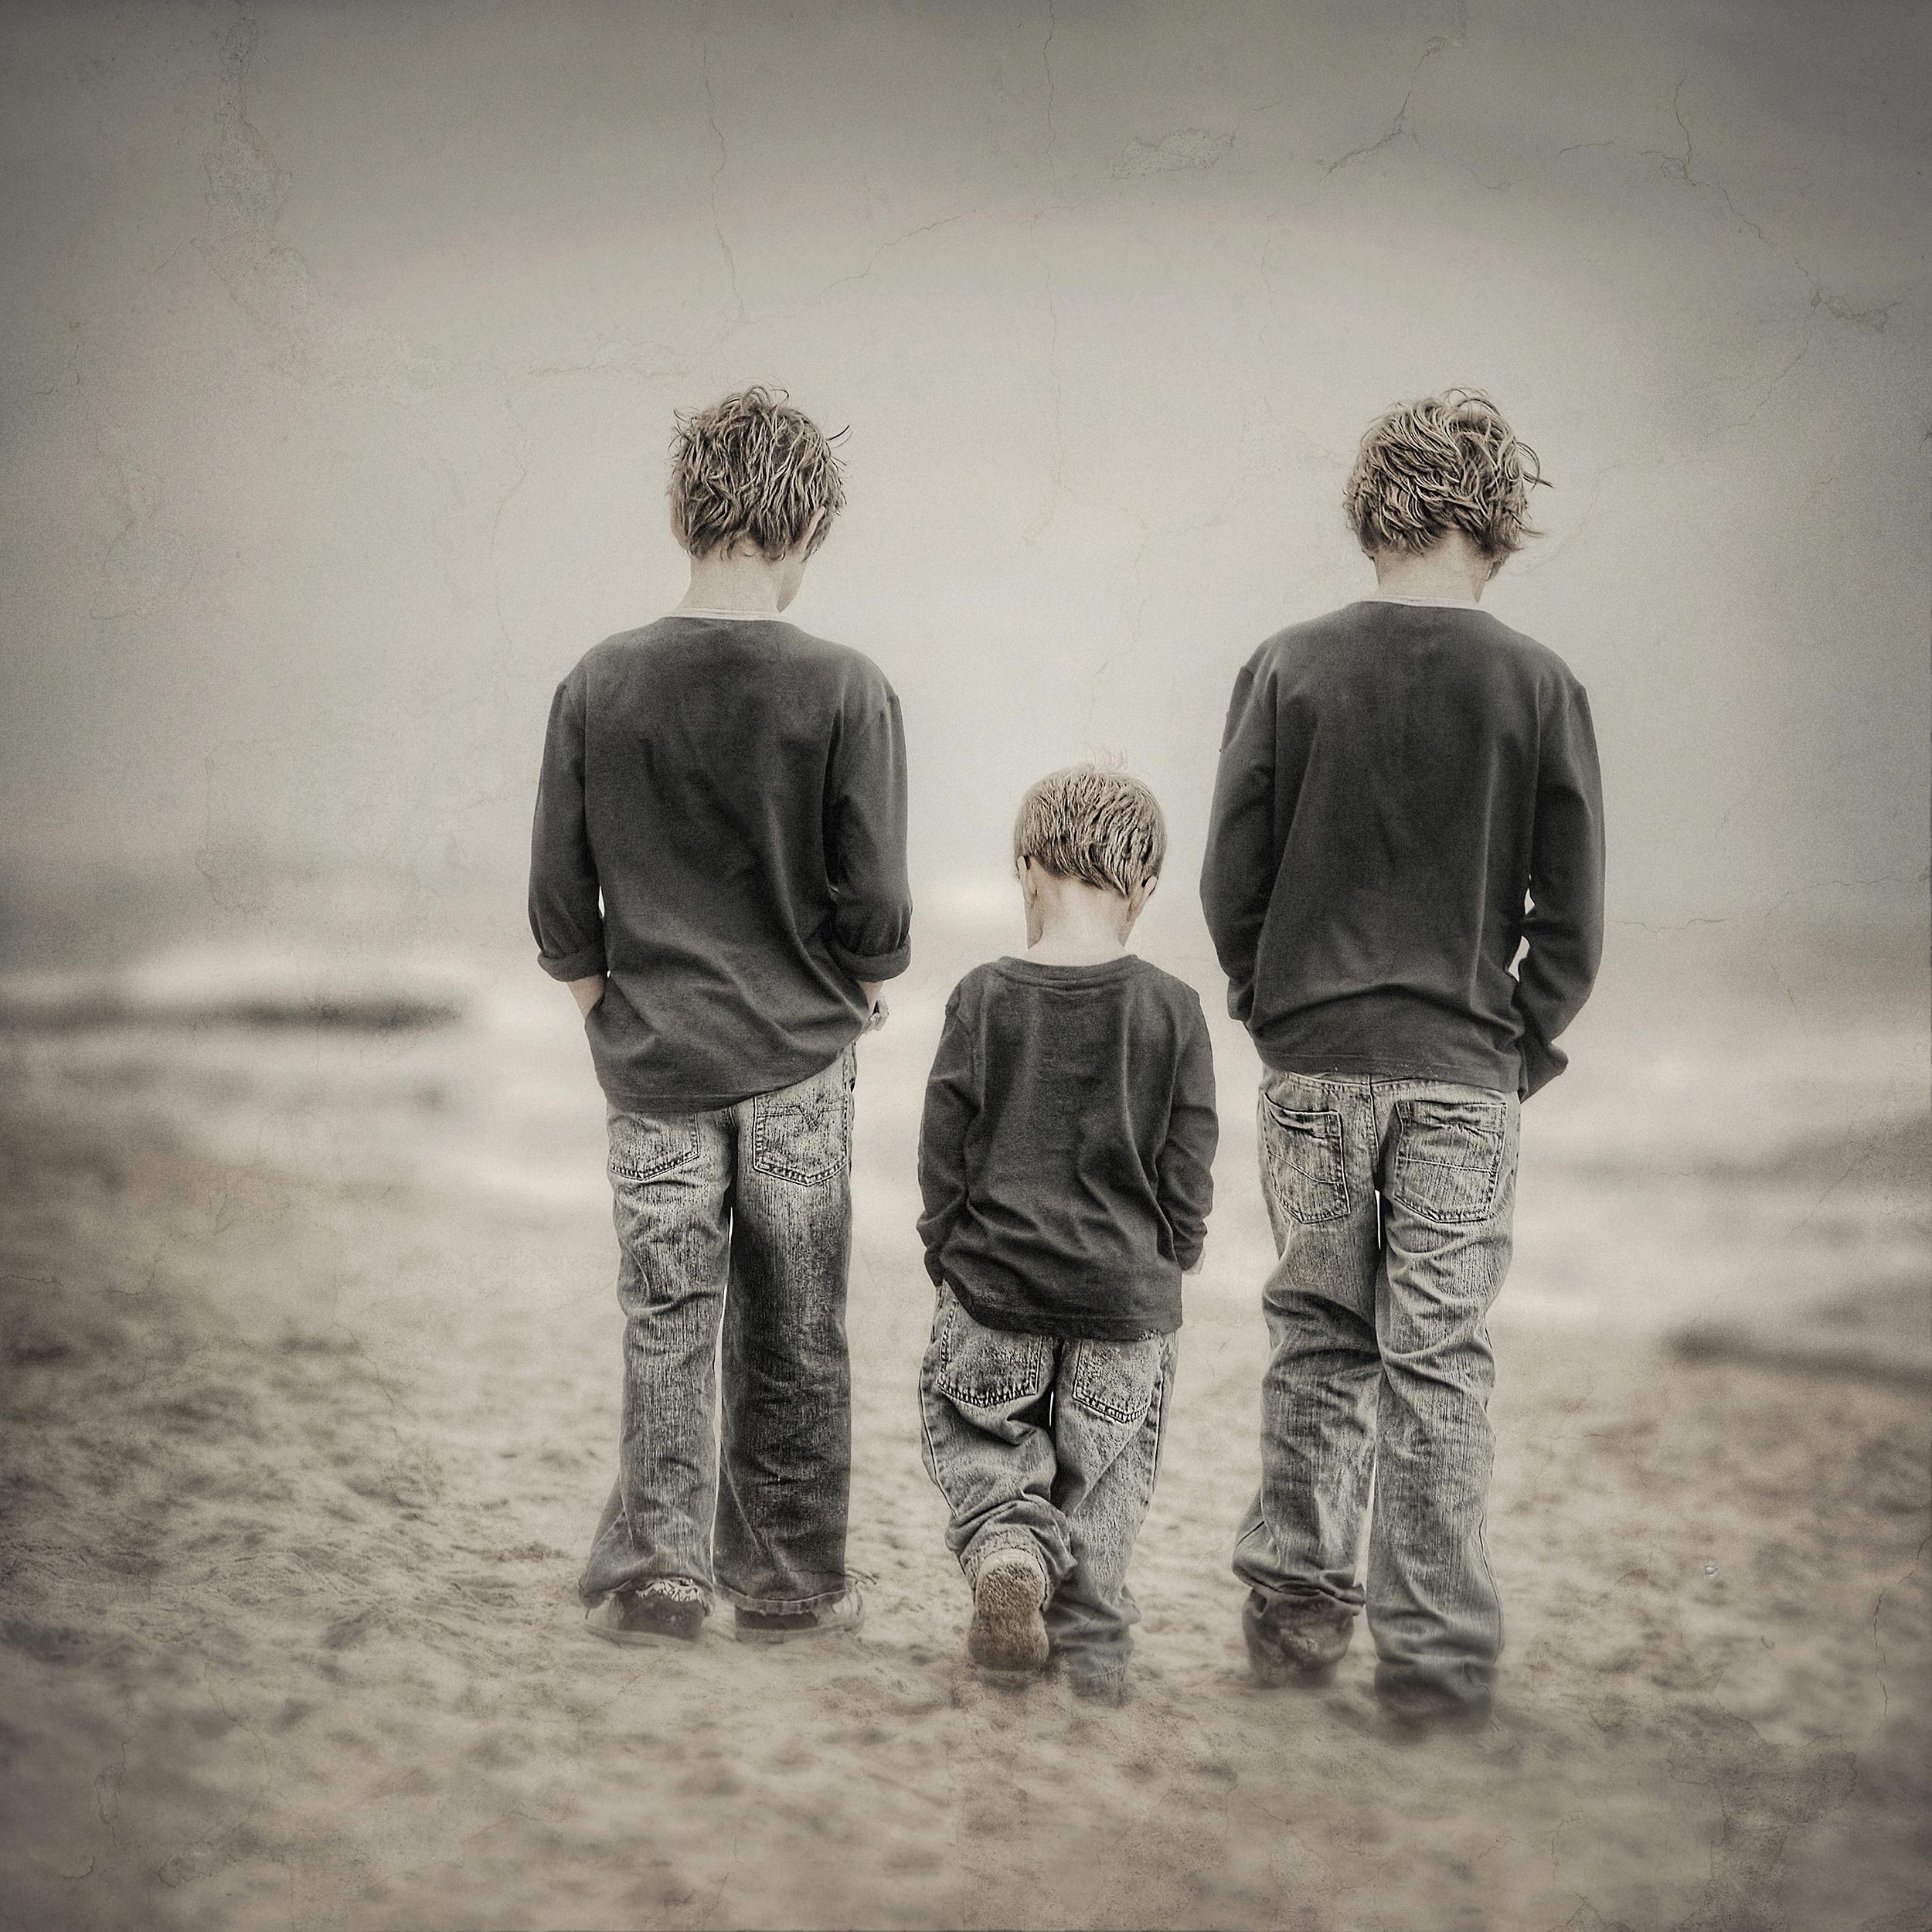 Gallery-brothers portraits-beach portraits-boys.jpg